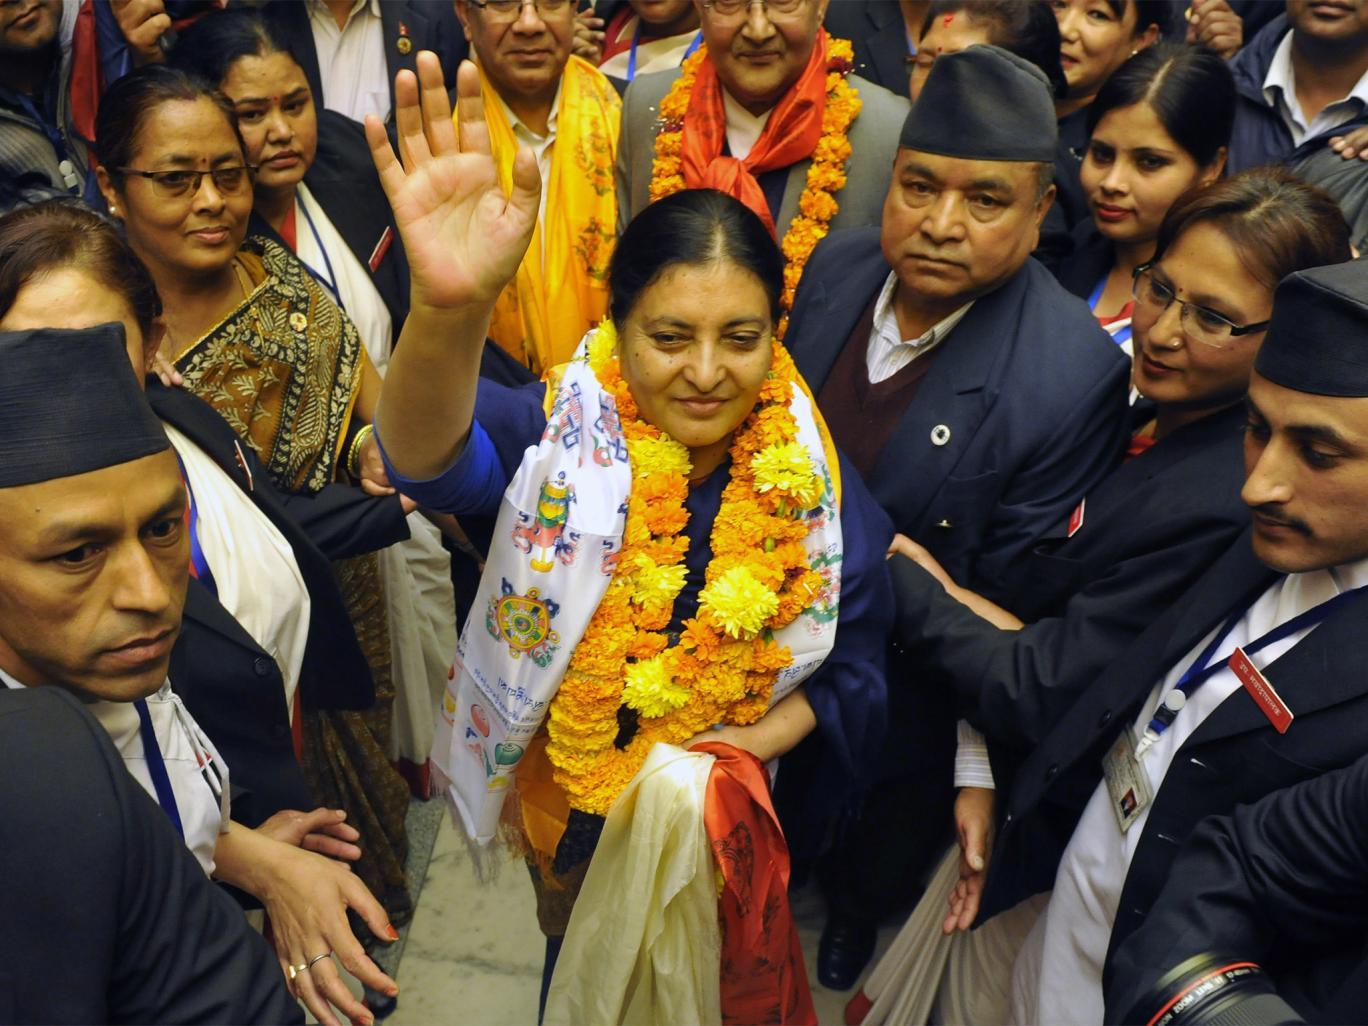 pg-26-nepal-getty